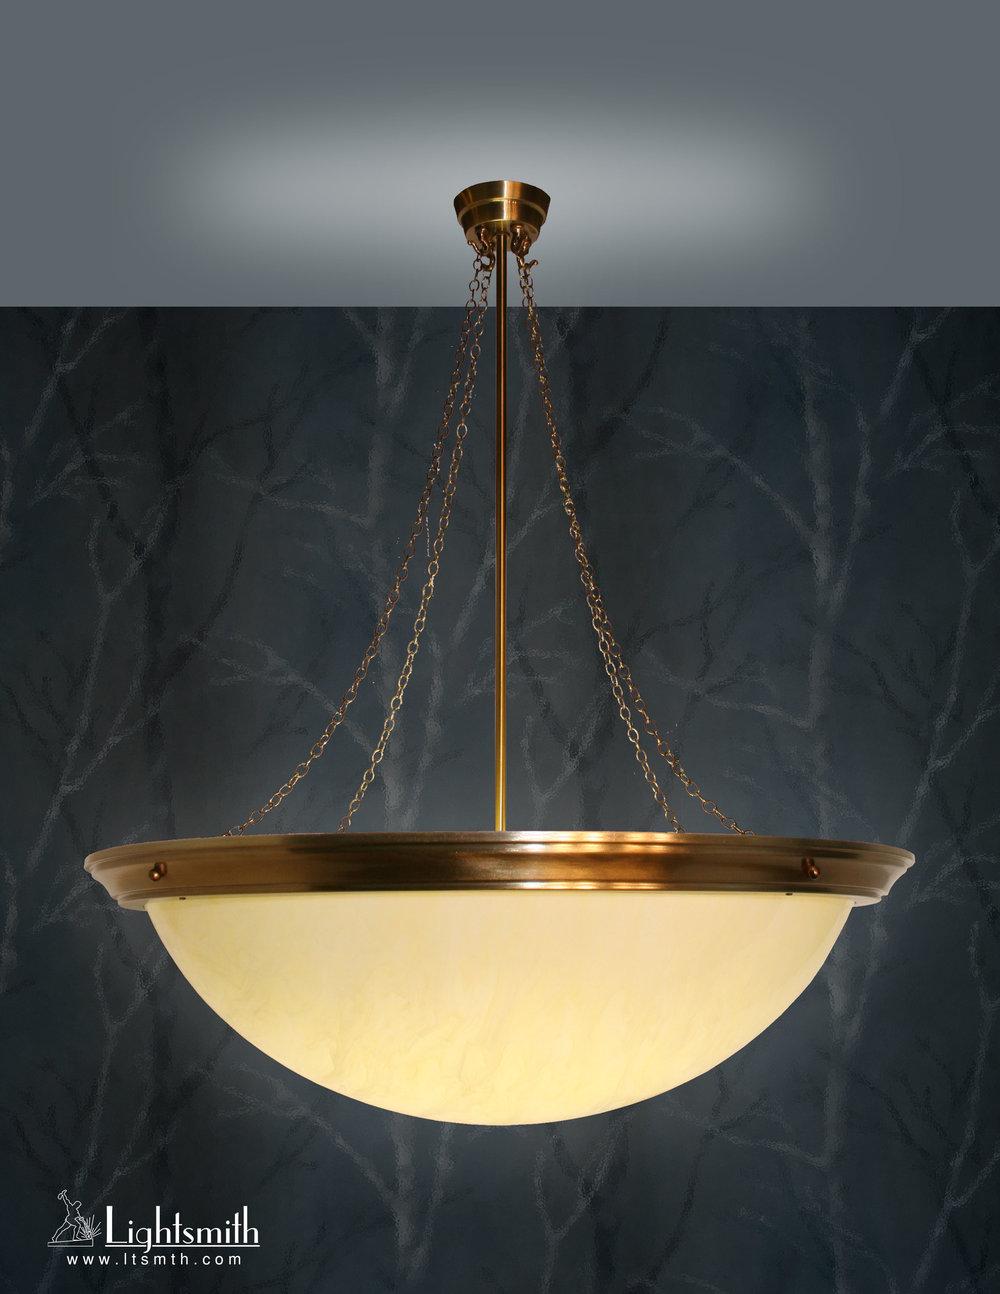 PD-2605 - Satin Bronze - Honey Alabaster Acrylic